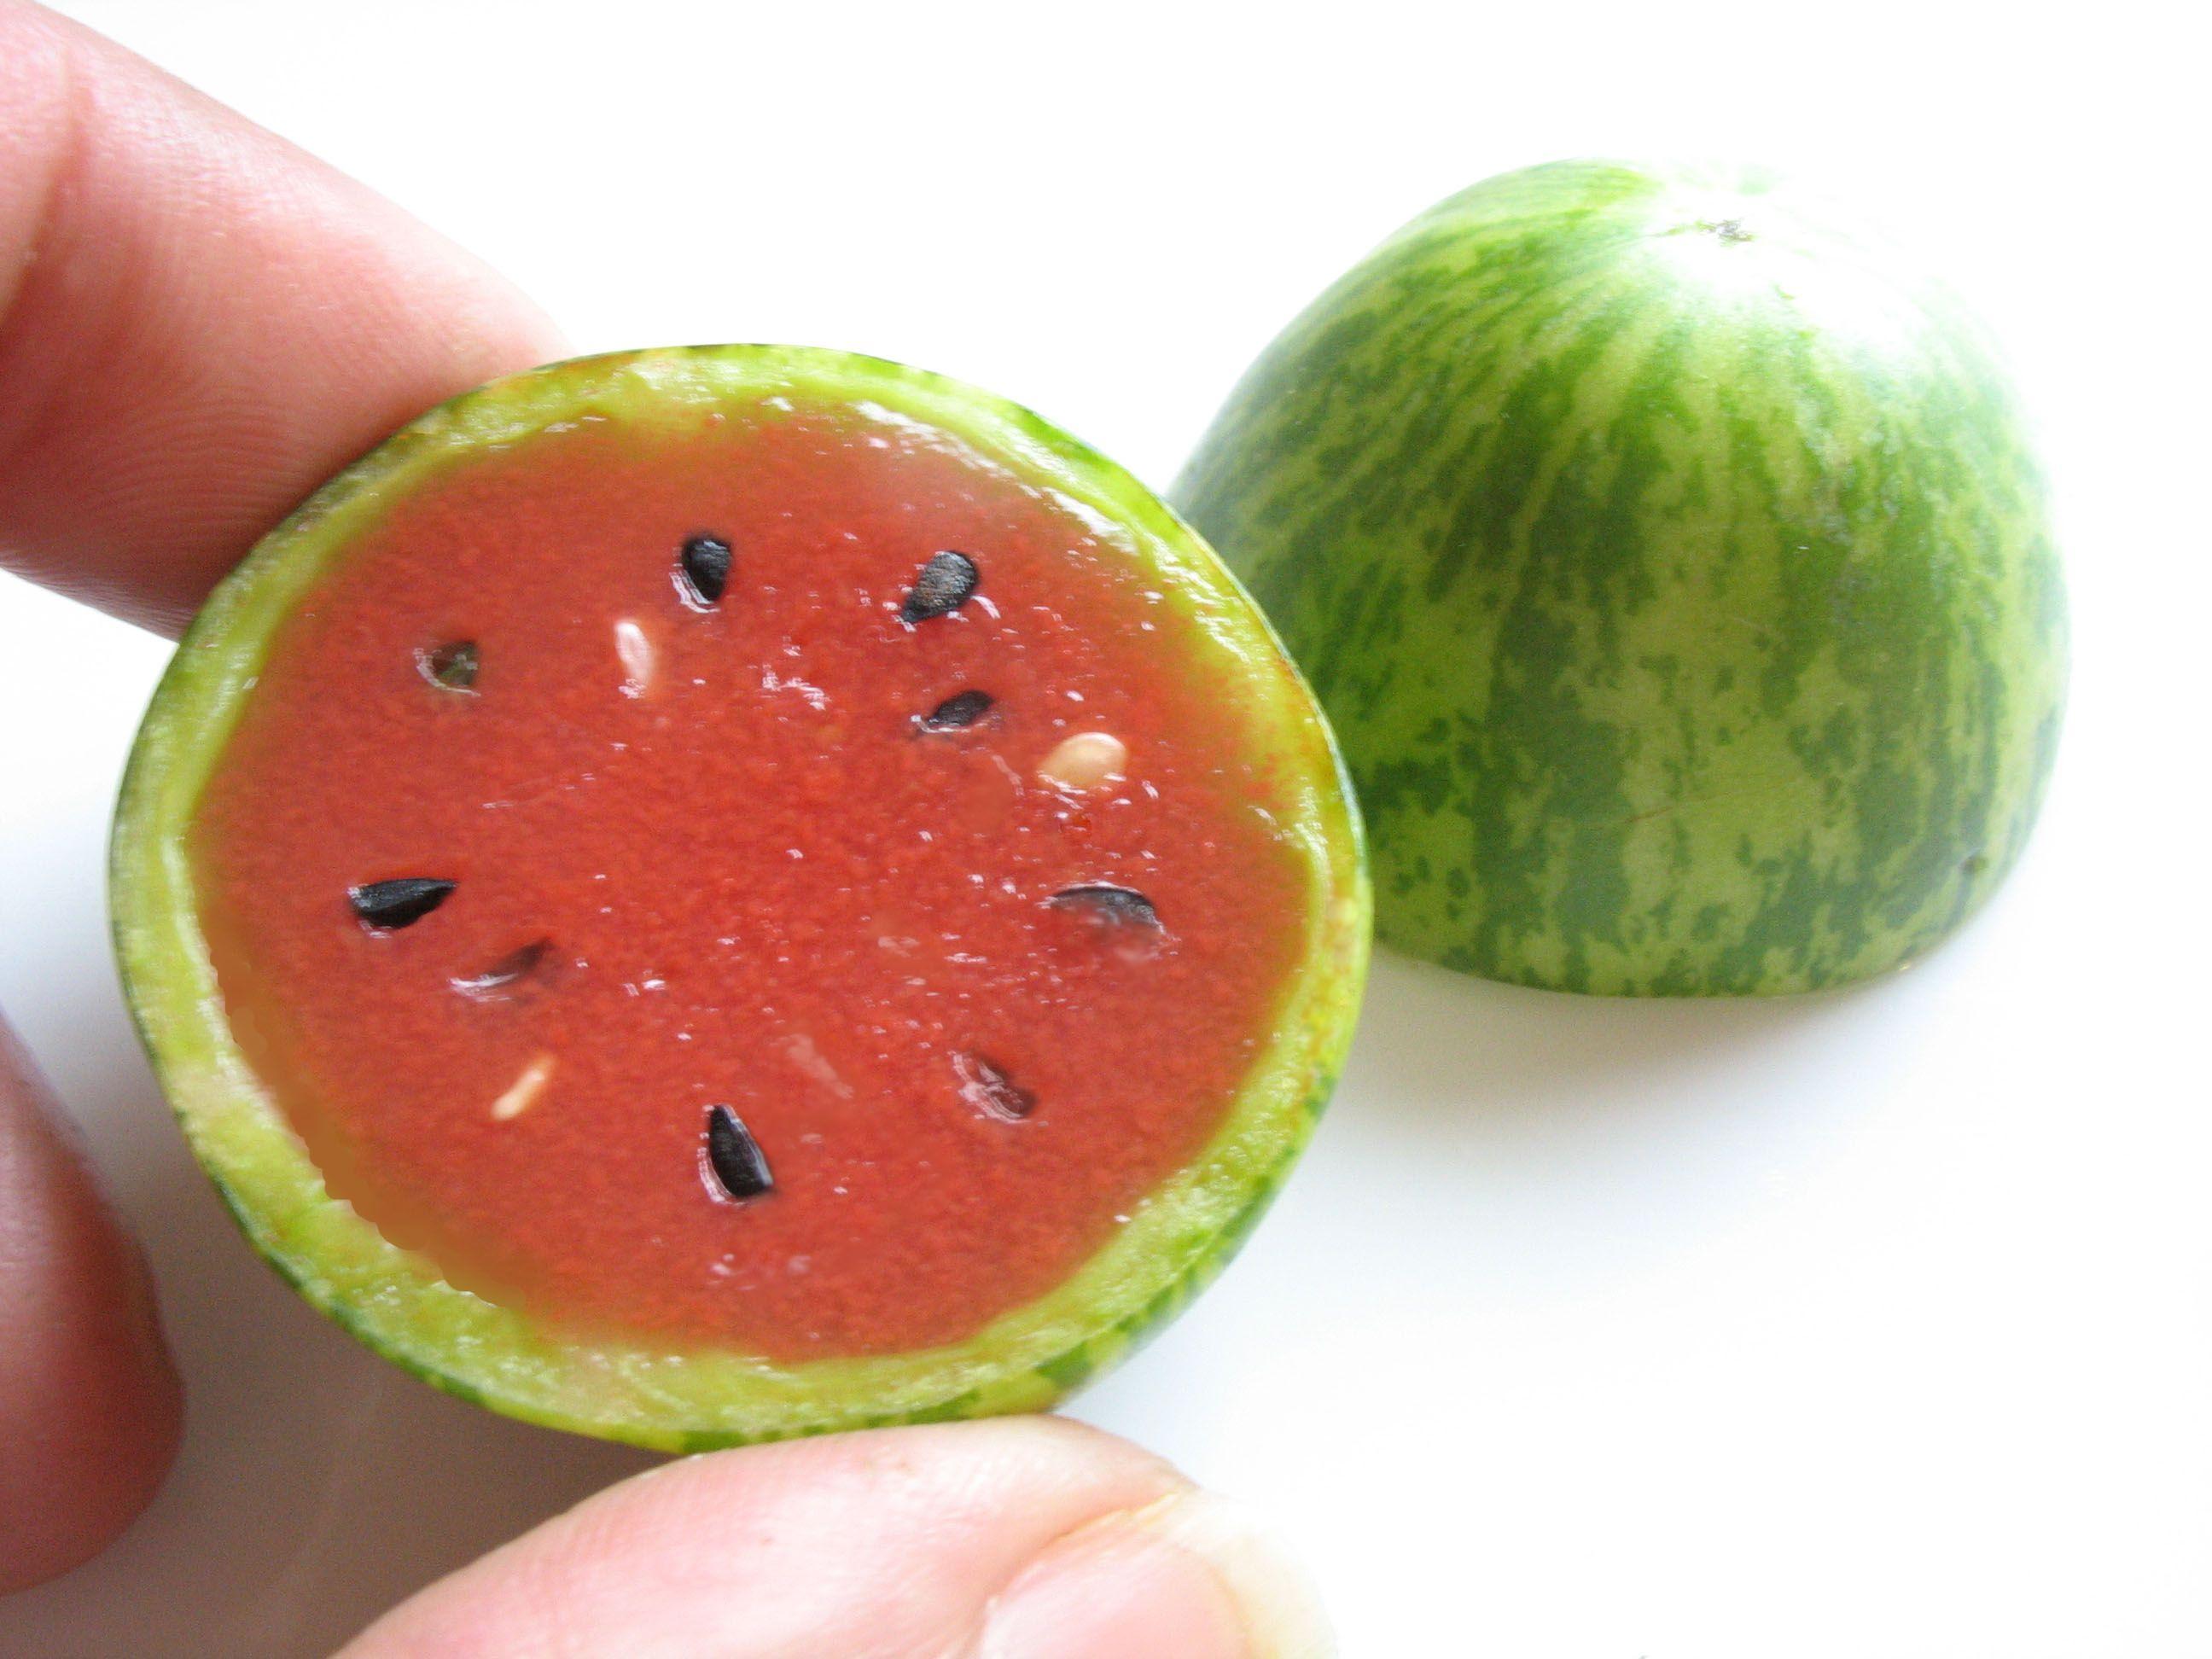 Baby watermelon...how cute!